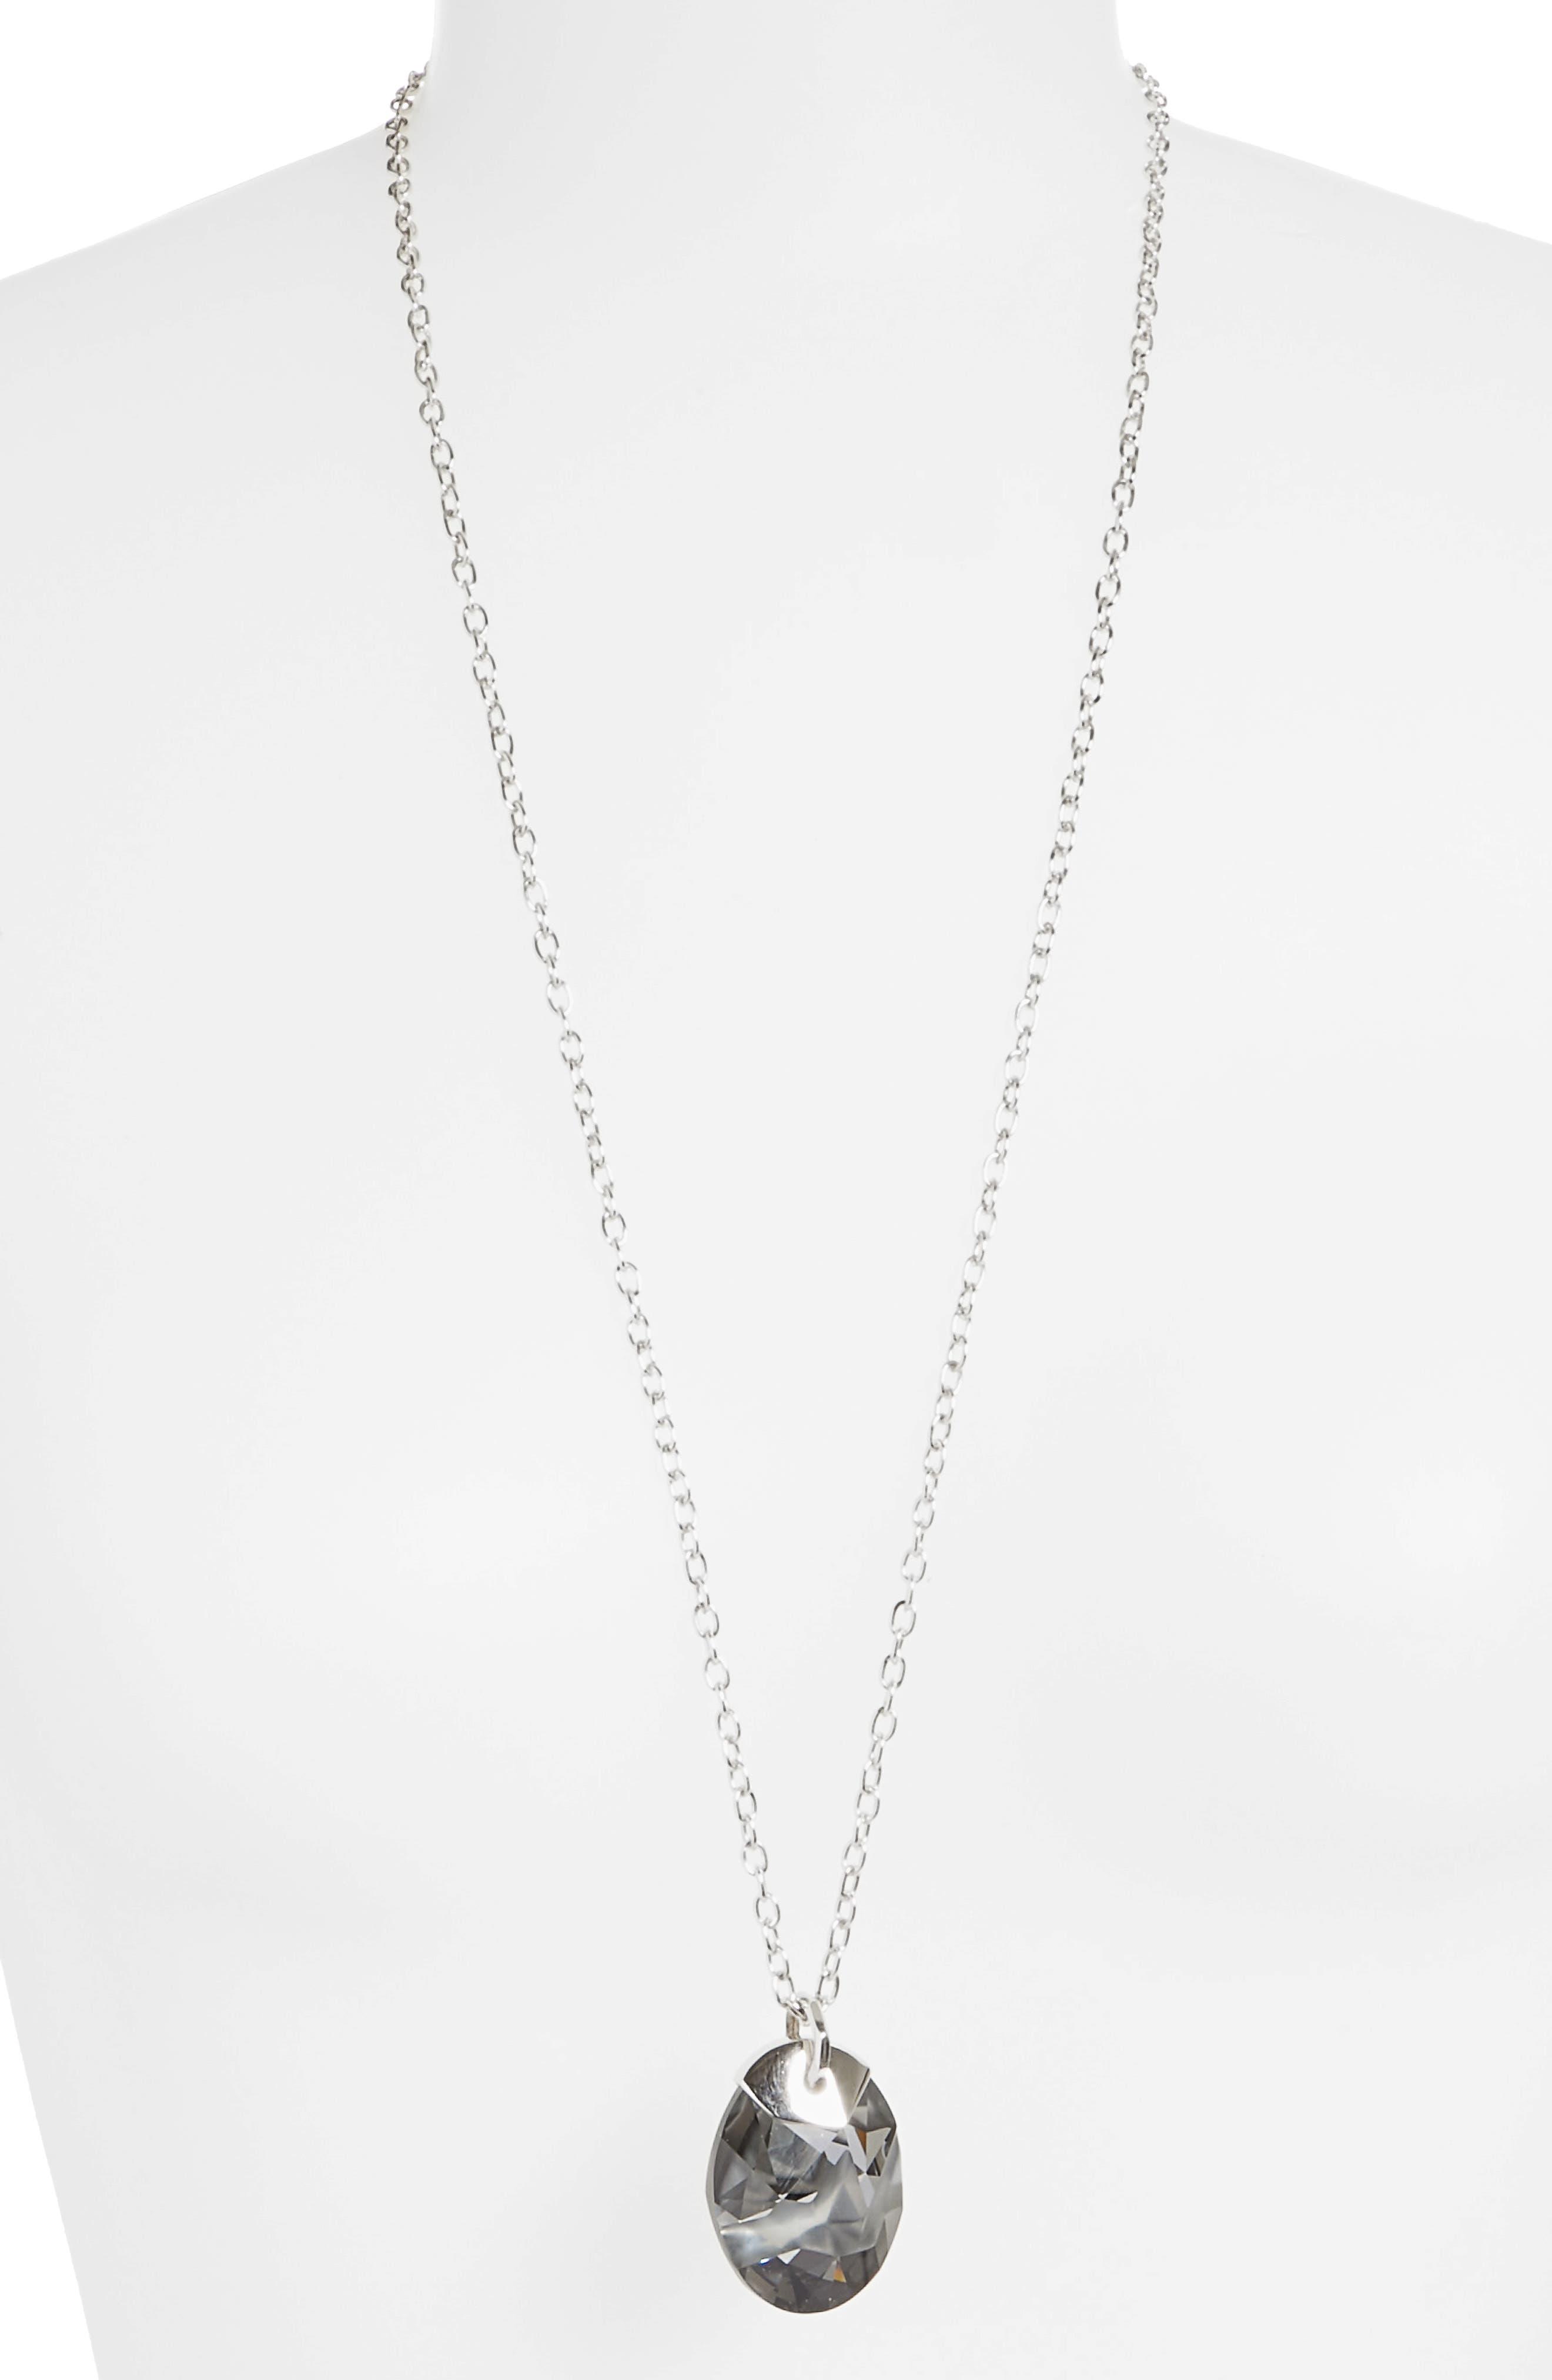 Swarovski Crystal Pendant Necklace,                             Alternate thumbnail 2, color,                             020